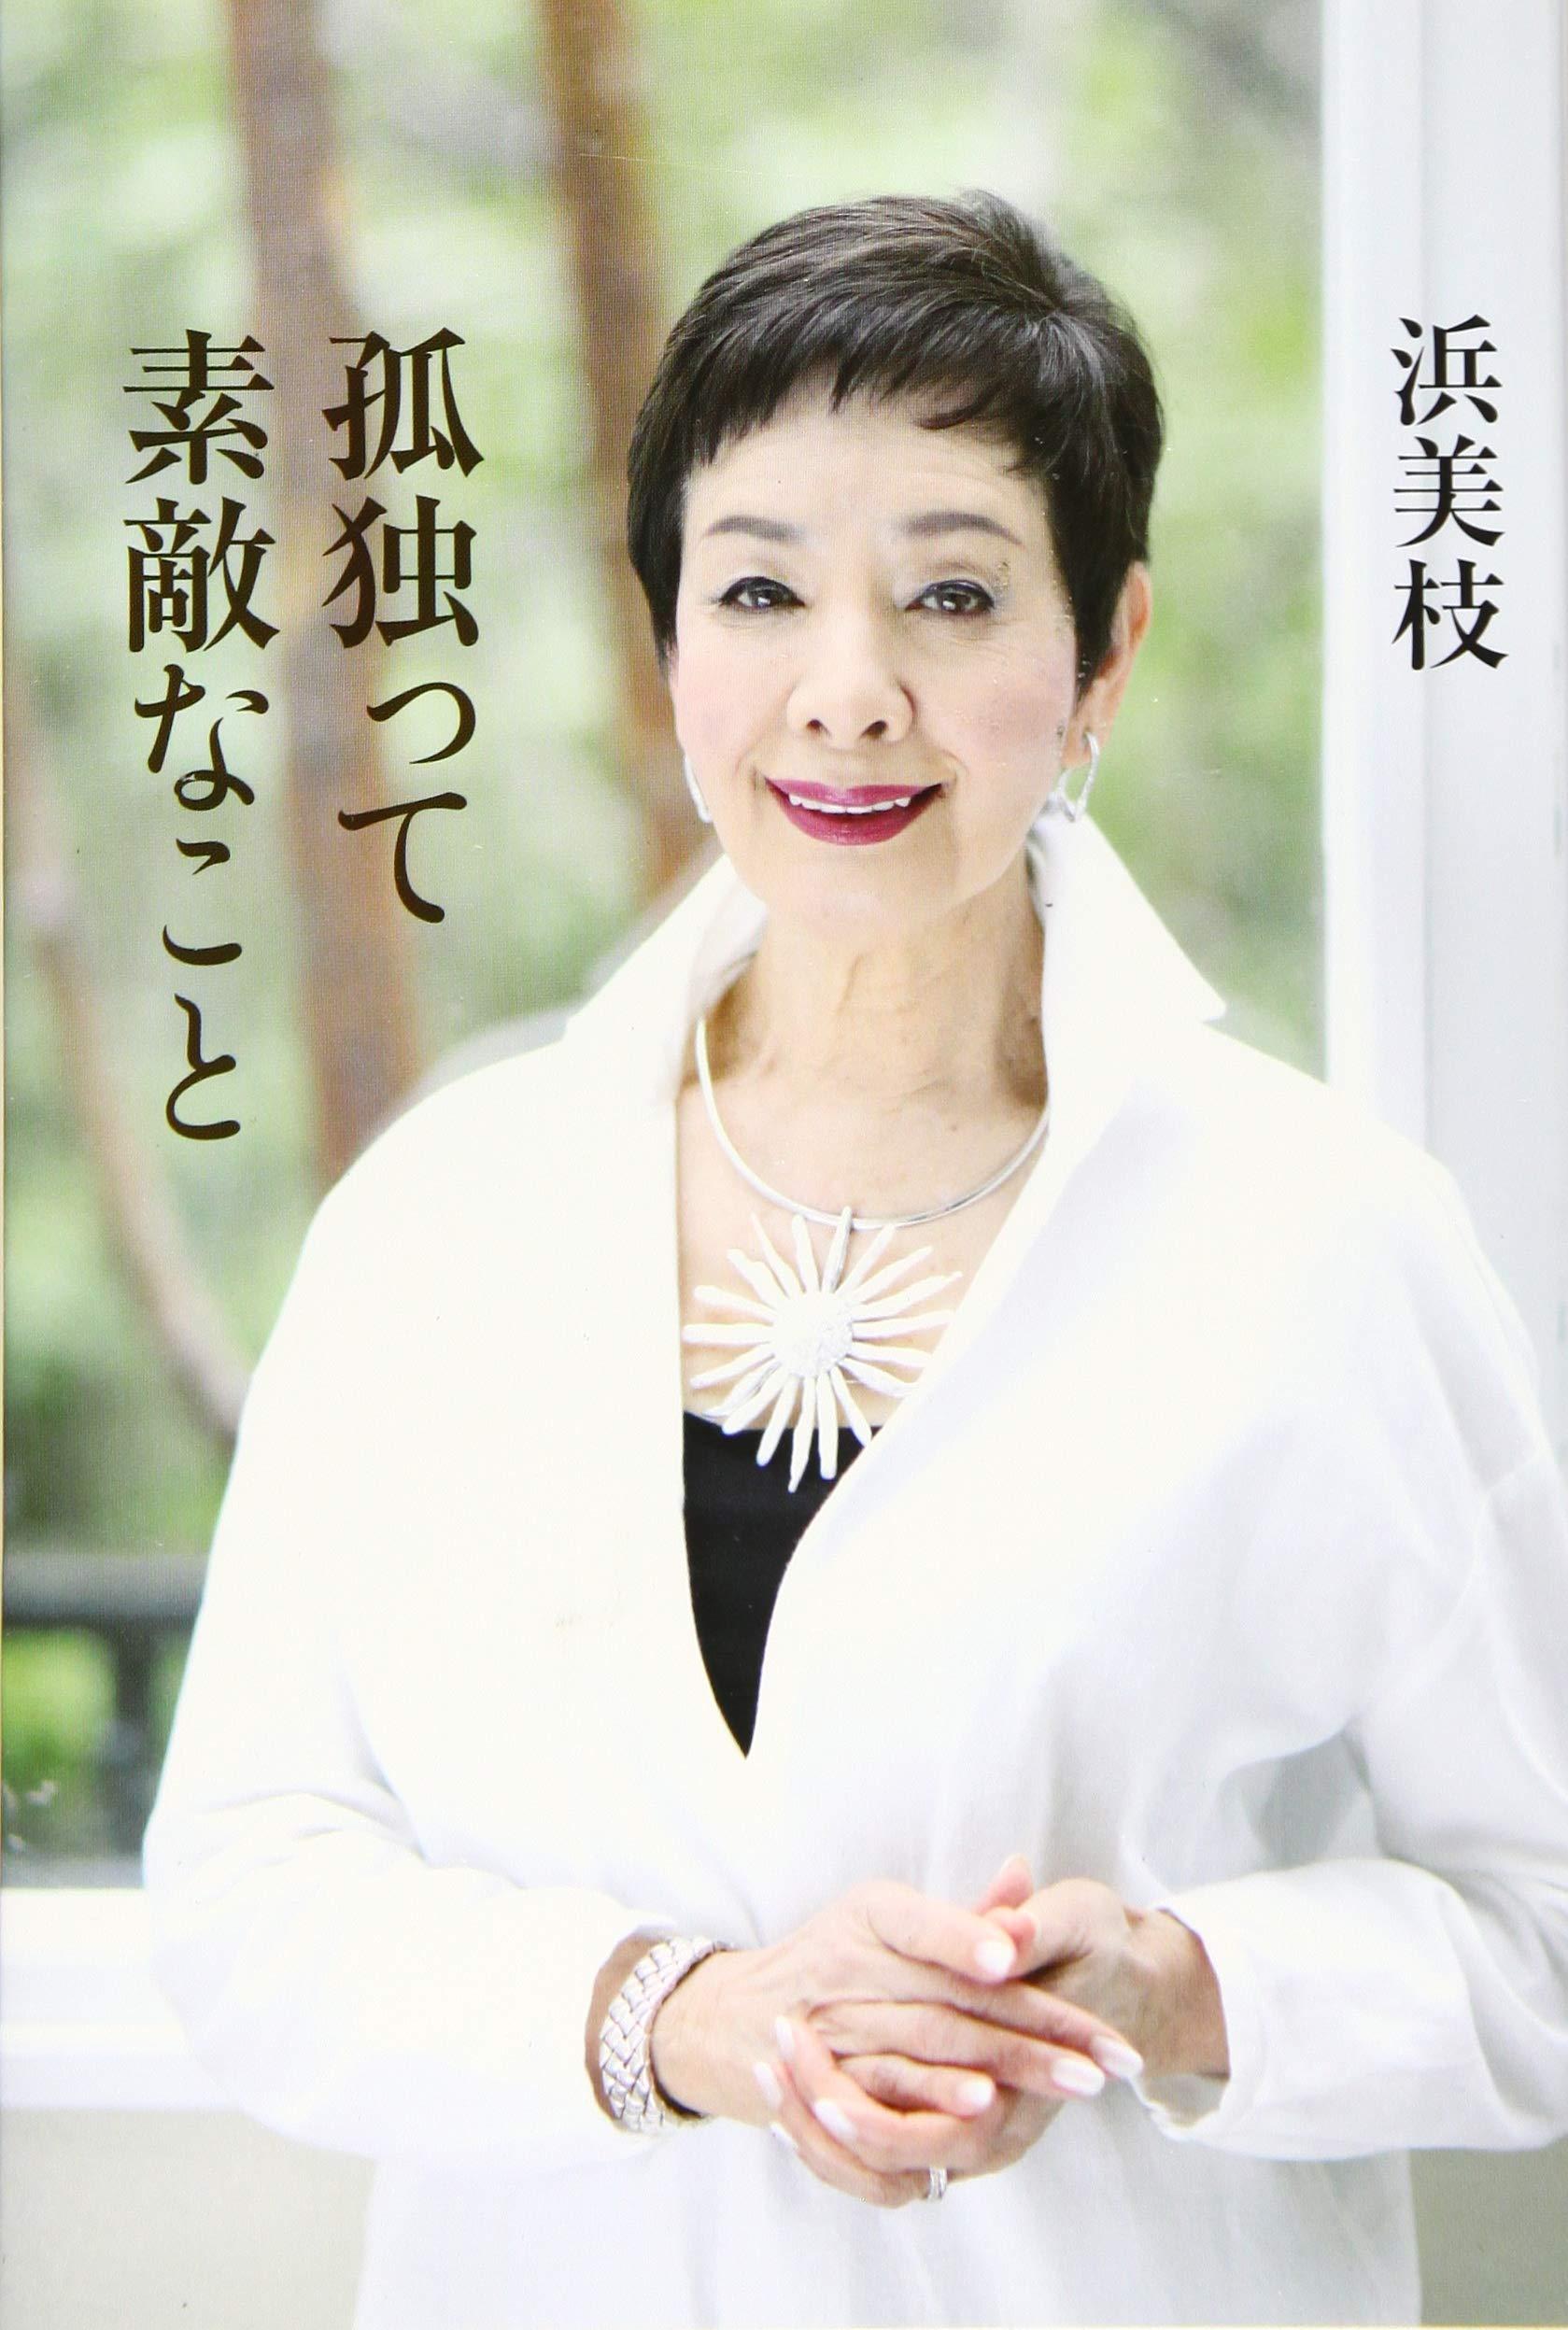 Amazon.co.jp: 孤独って素敵なこと: 浜 美枝: 本